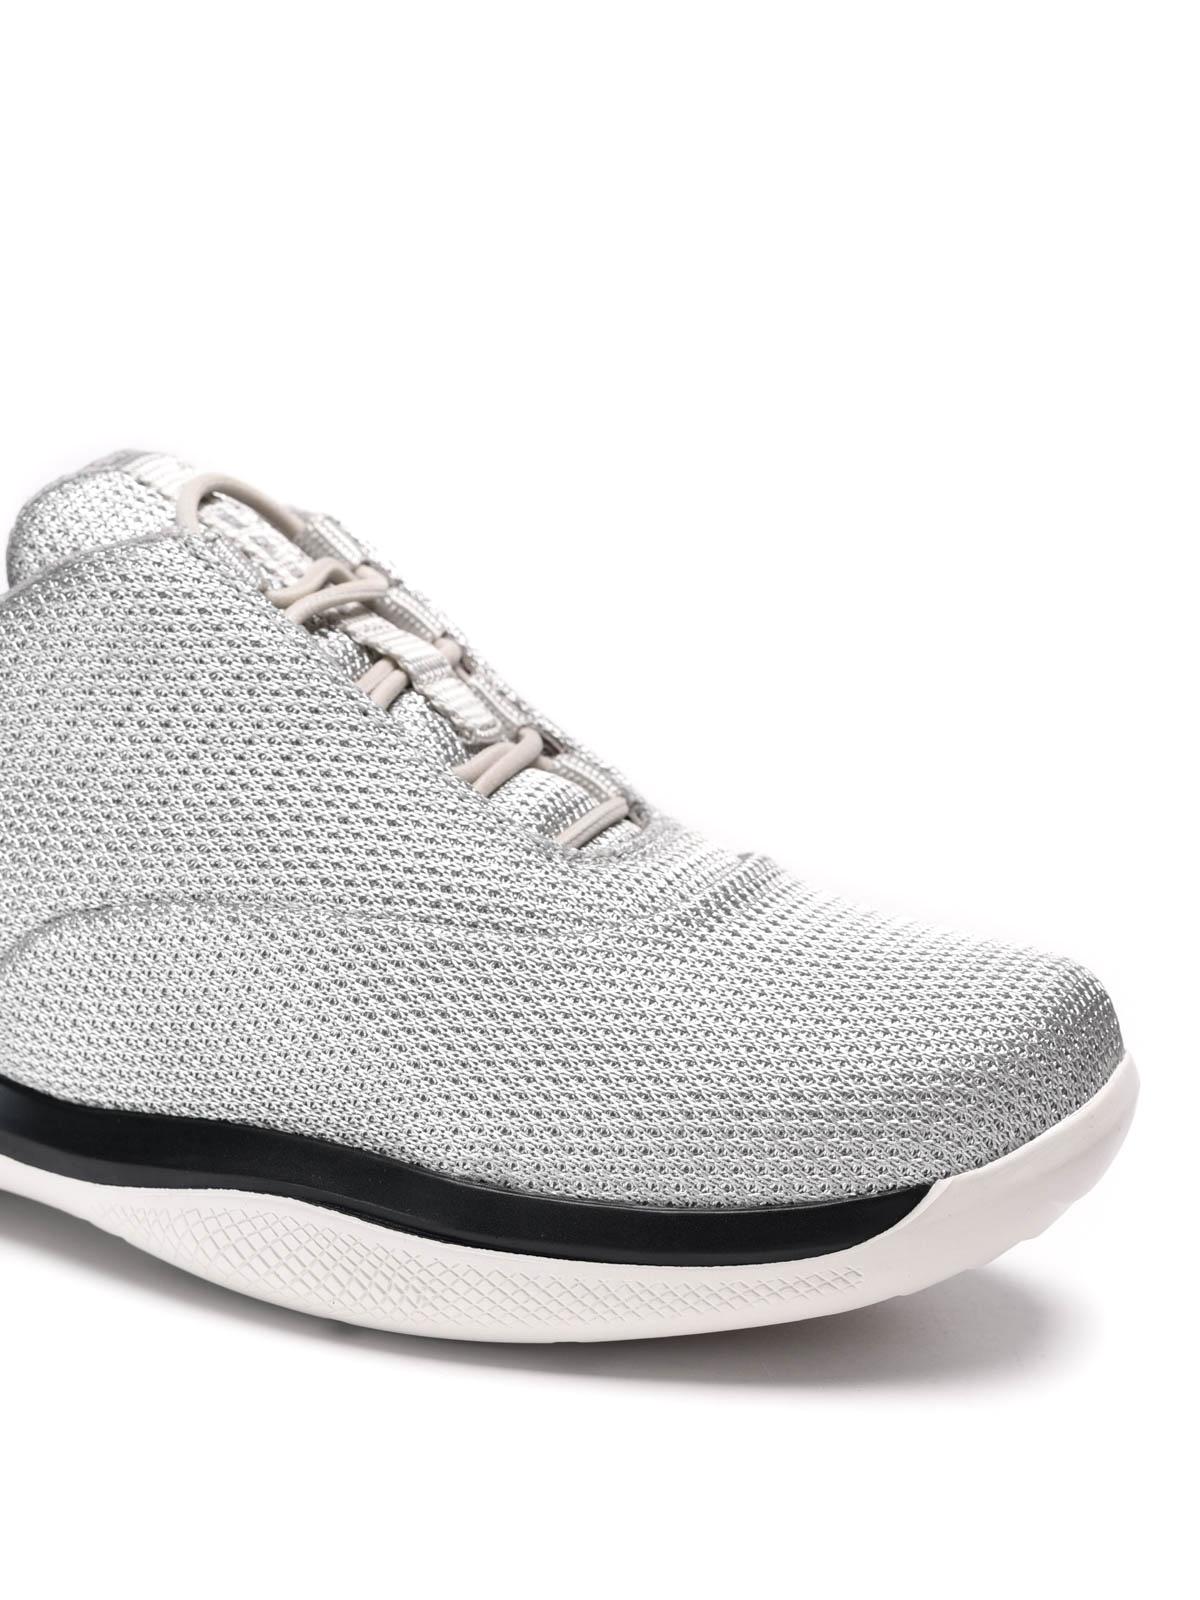 Damen Rossa Fur 3e6205 Sneaker Linea Prada Silber 4AR3jqc5LS